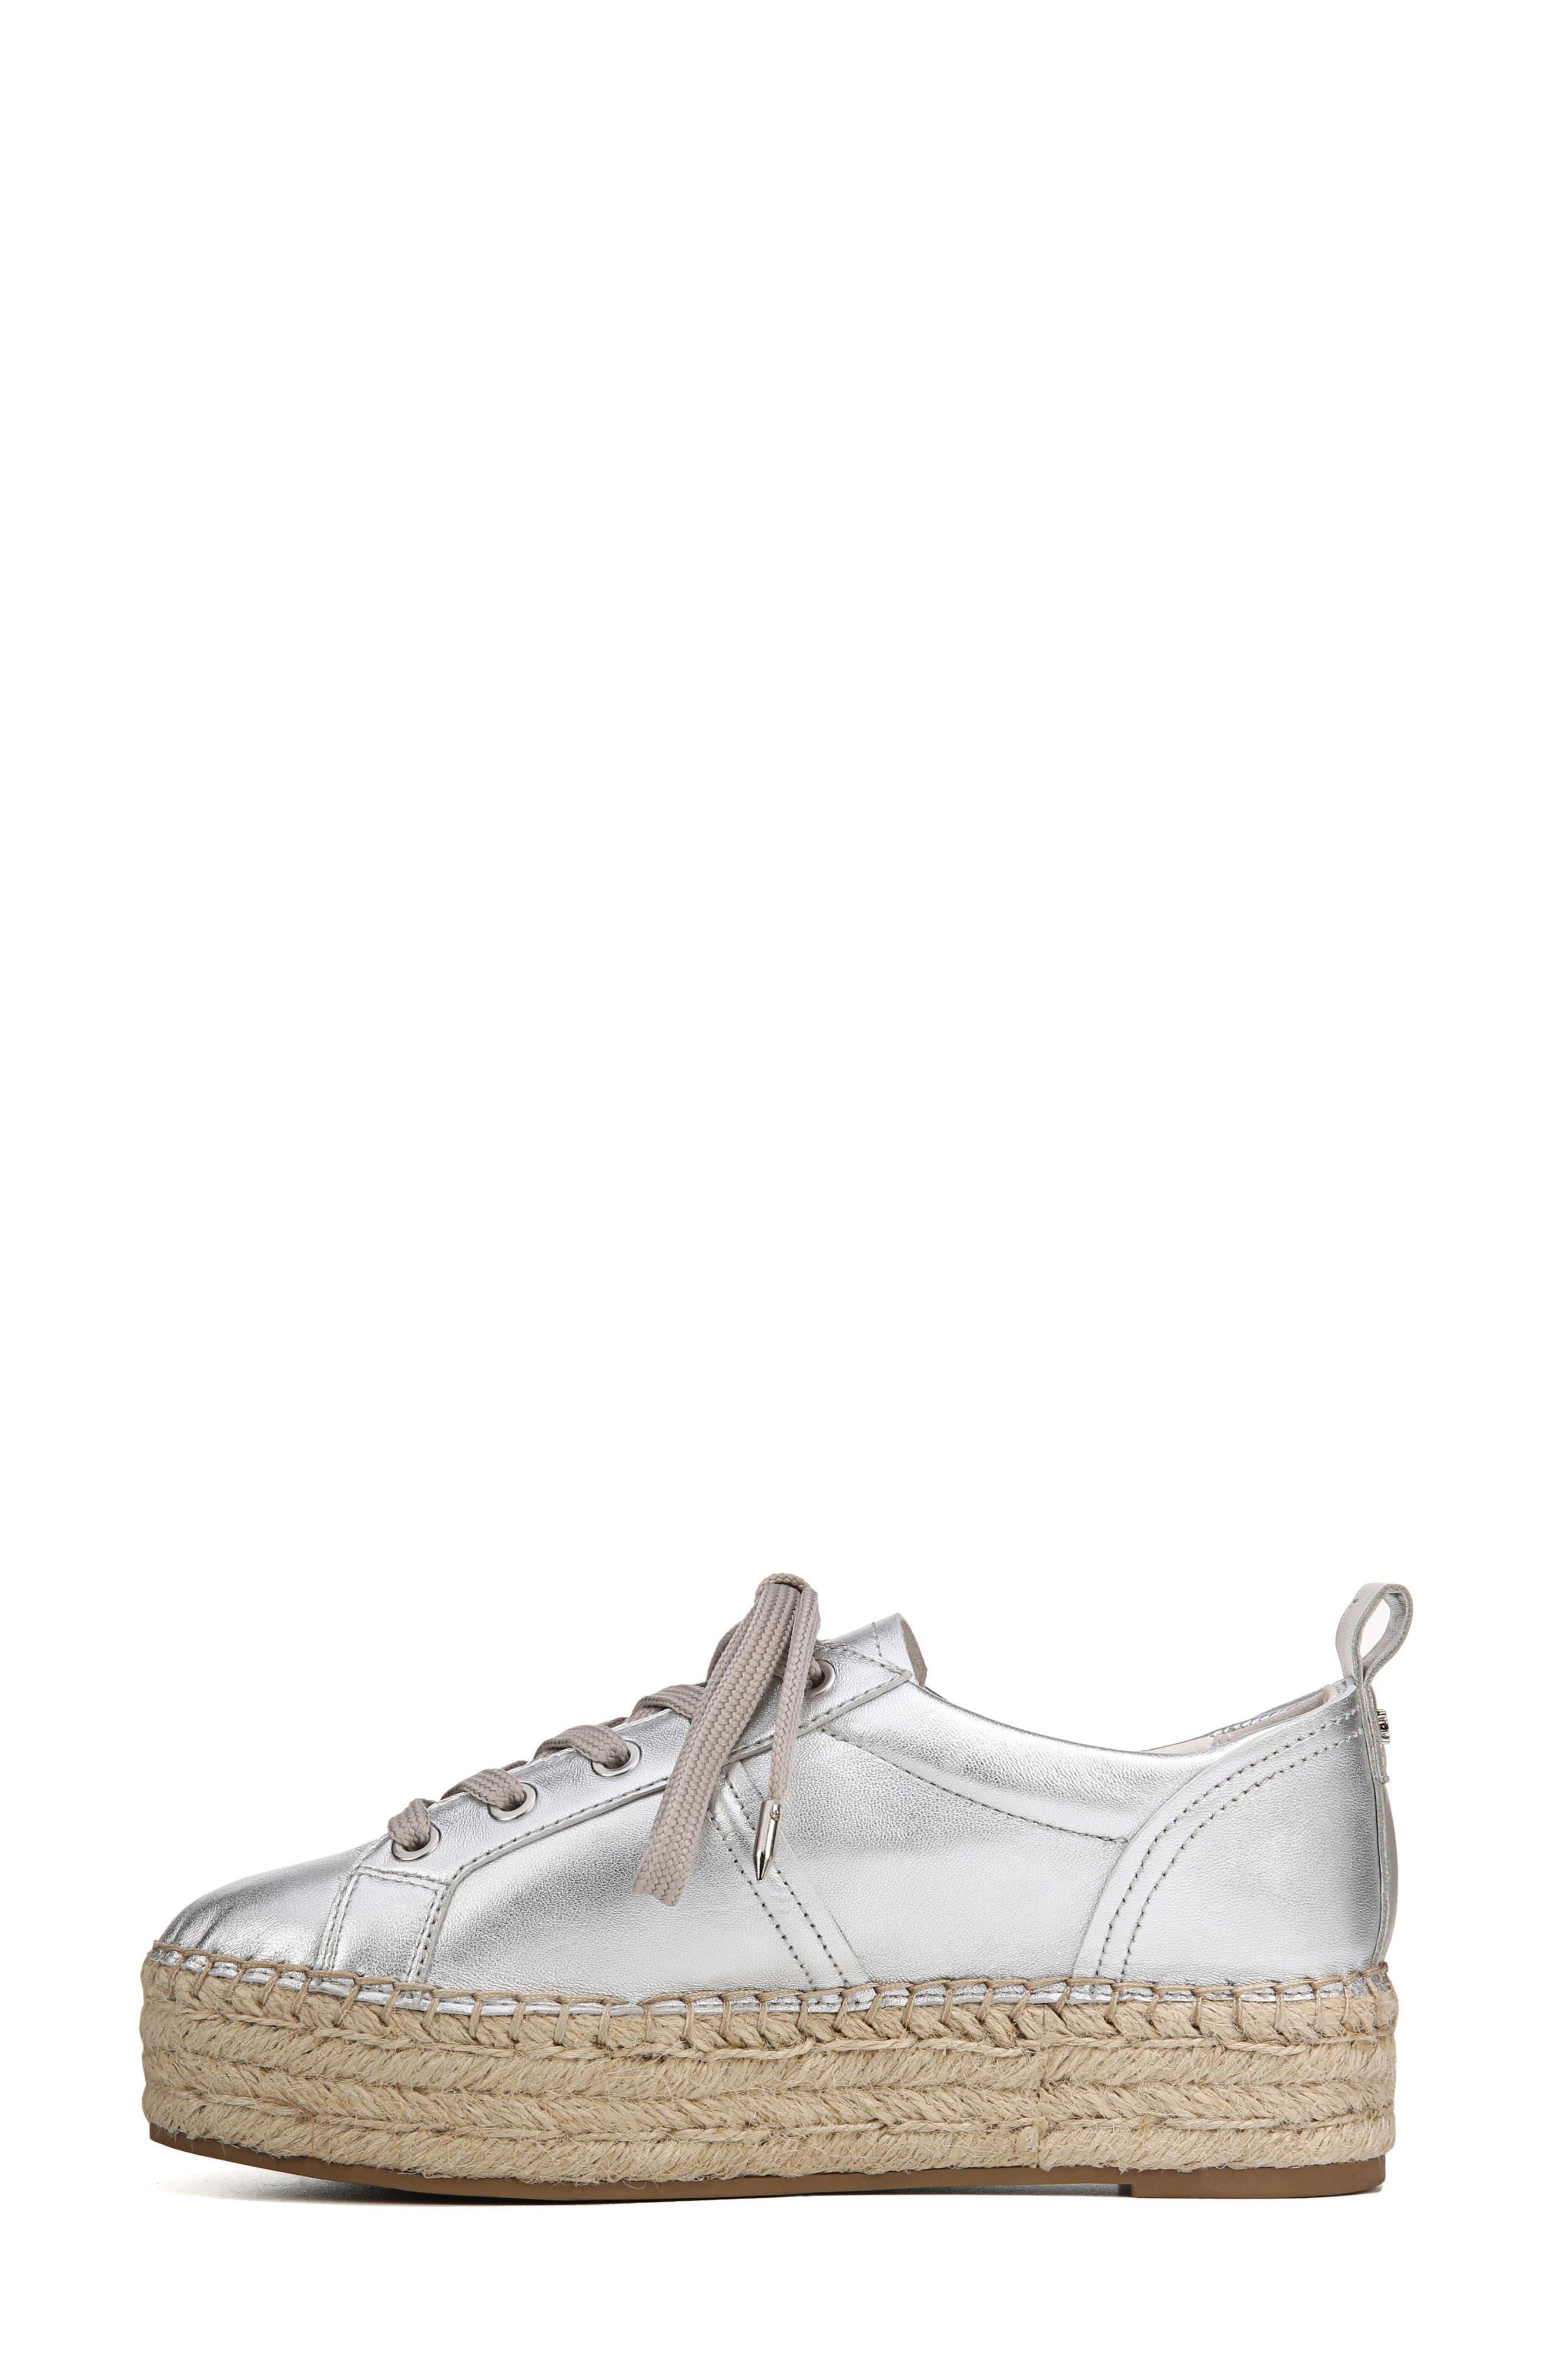 Carleigh Espadrille Sneaker,                             Alternate thumbnail 3, color,                             040